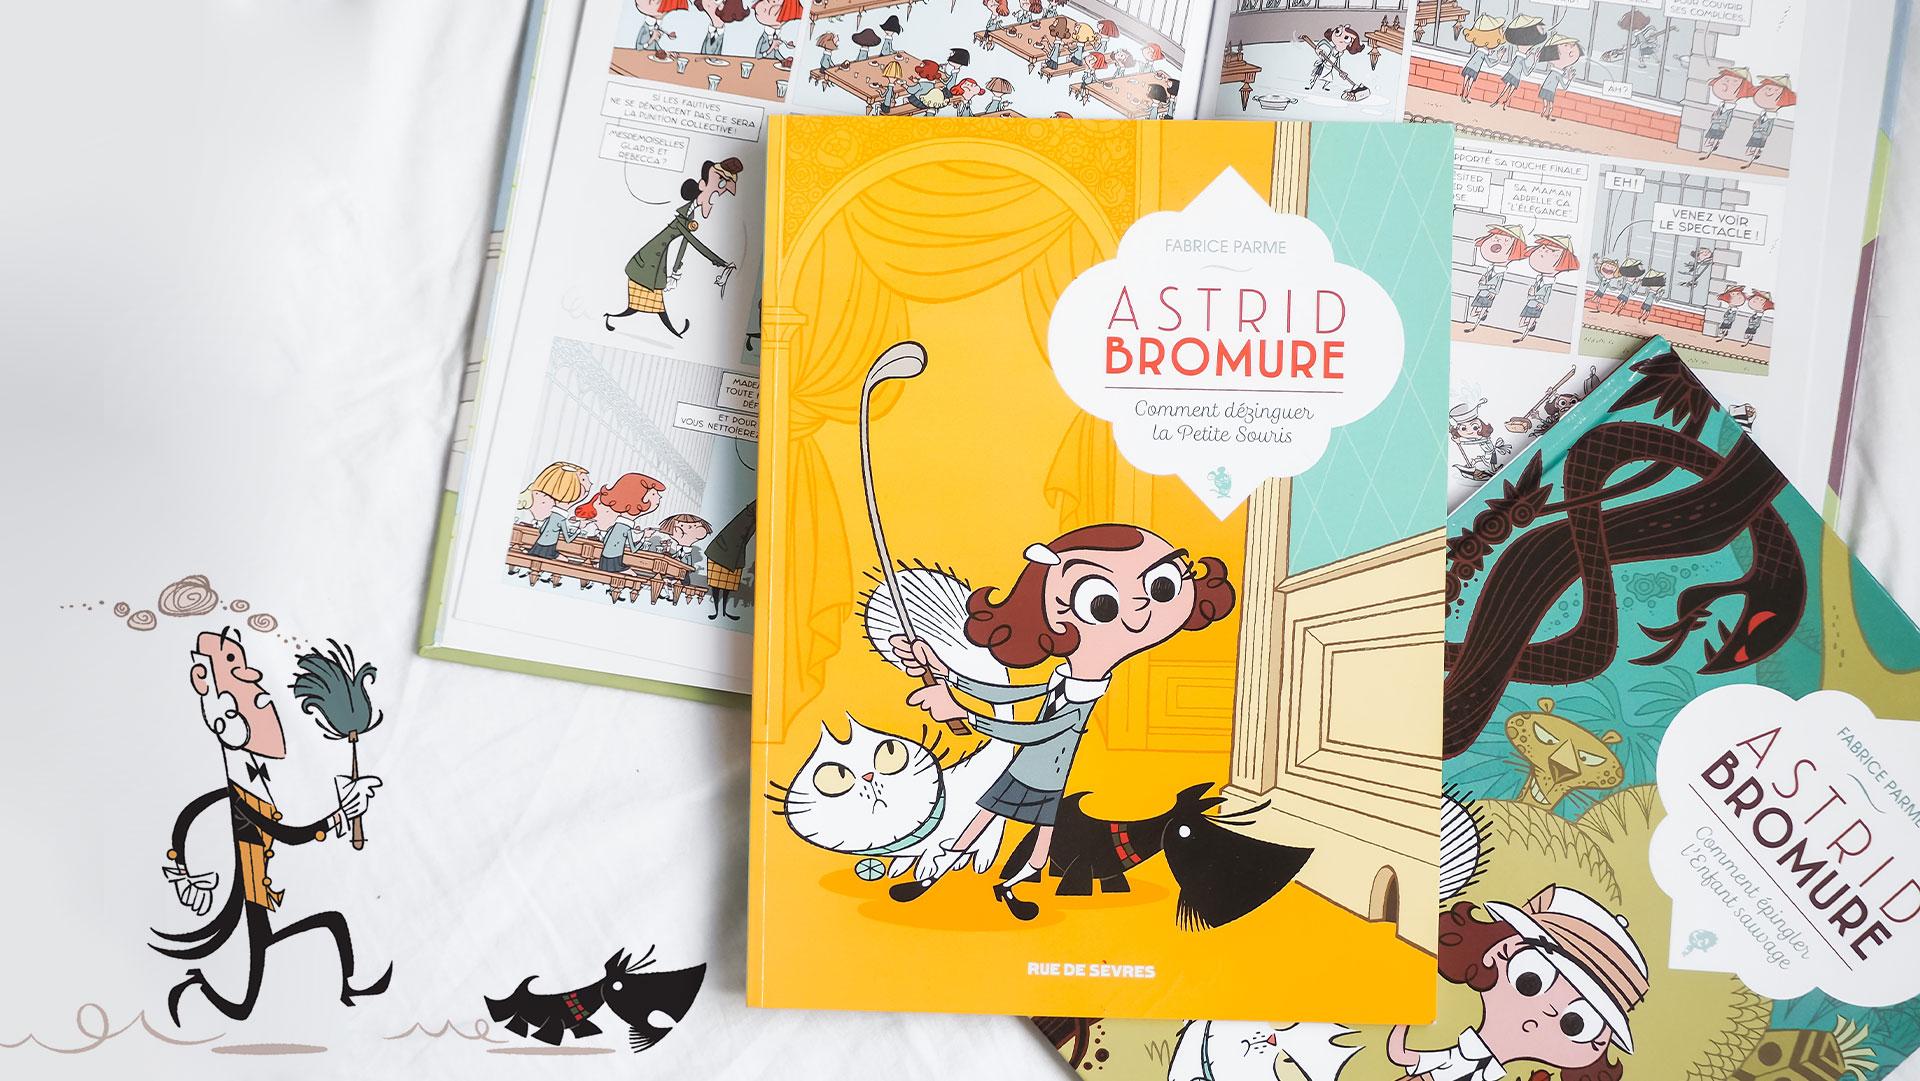 astrid-bromure-Fabrice-Parme